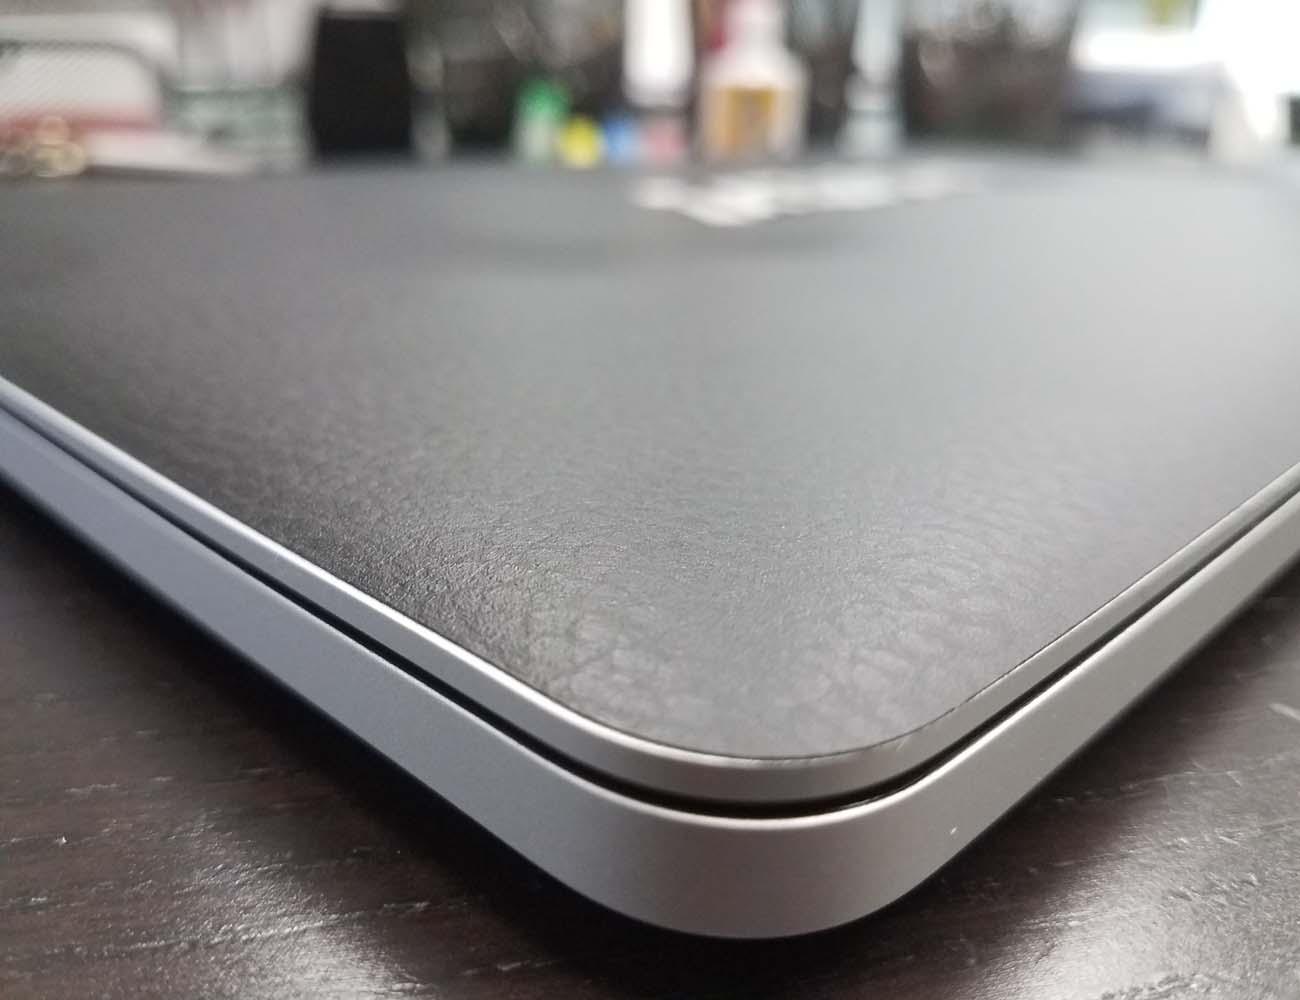 Leather+Series+MacBook+Pro+Skin+By+SlickWraps